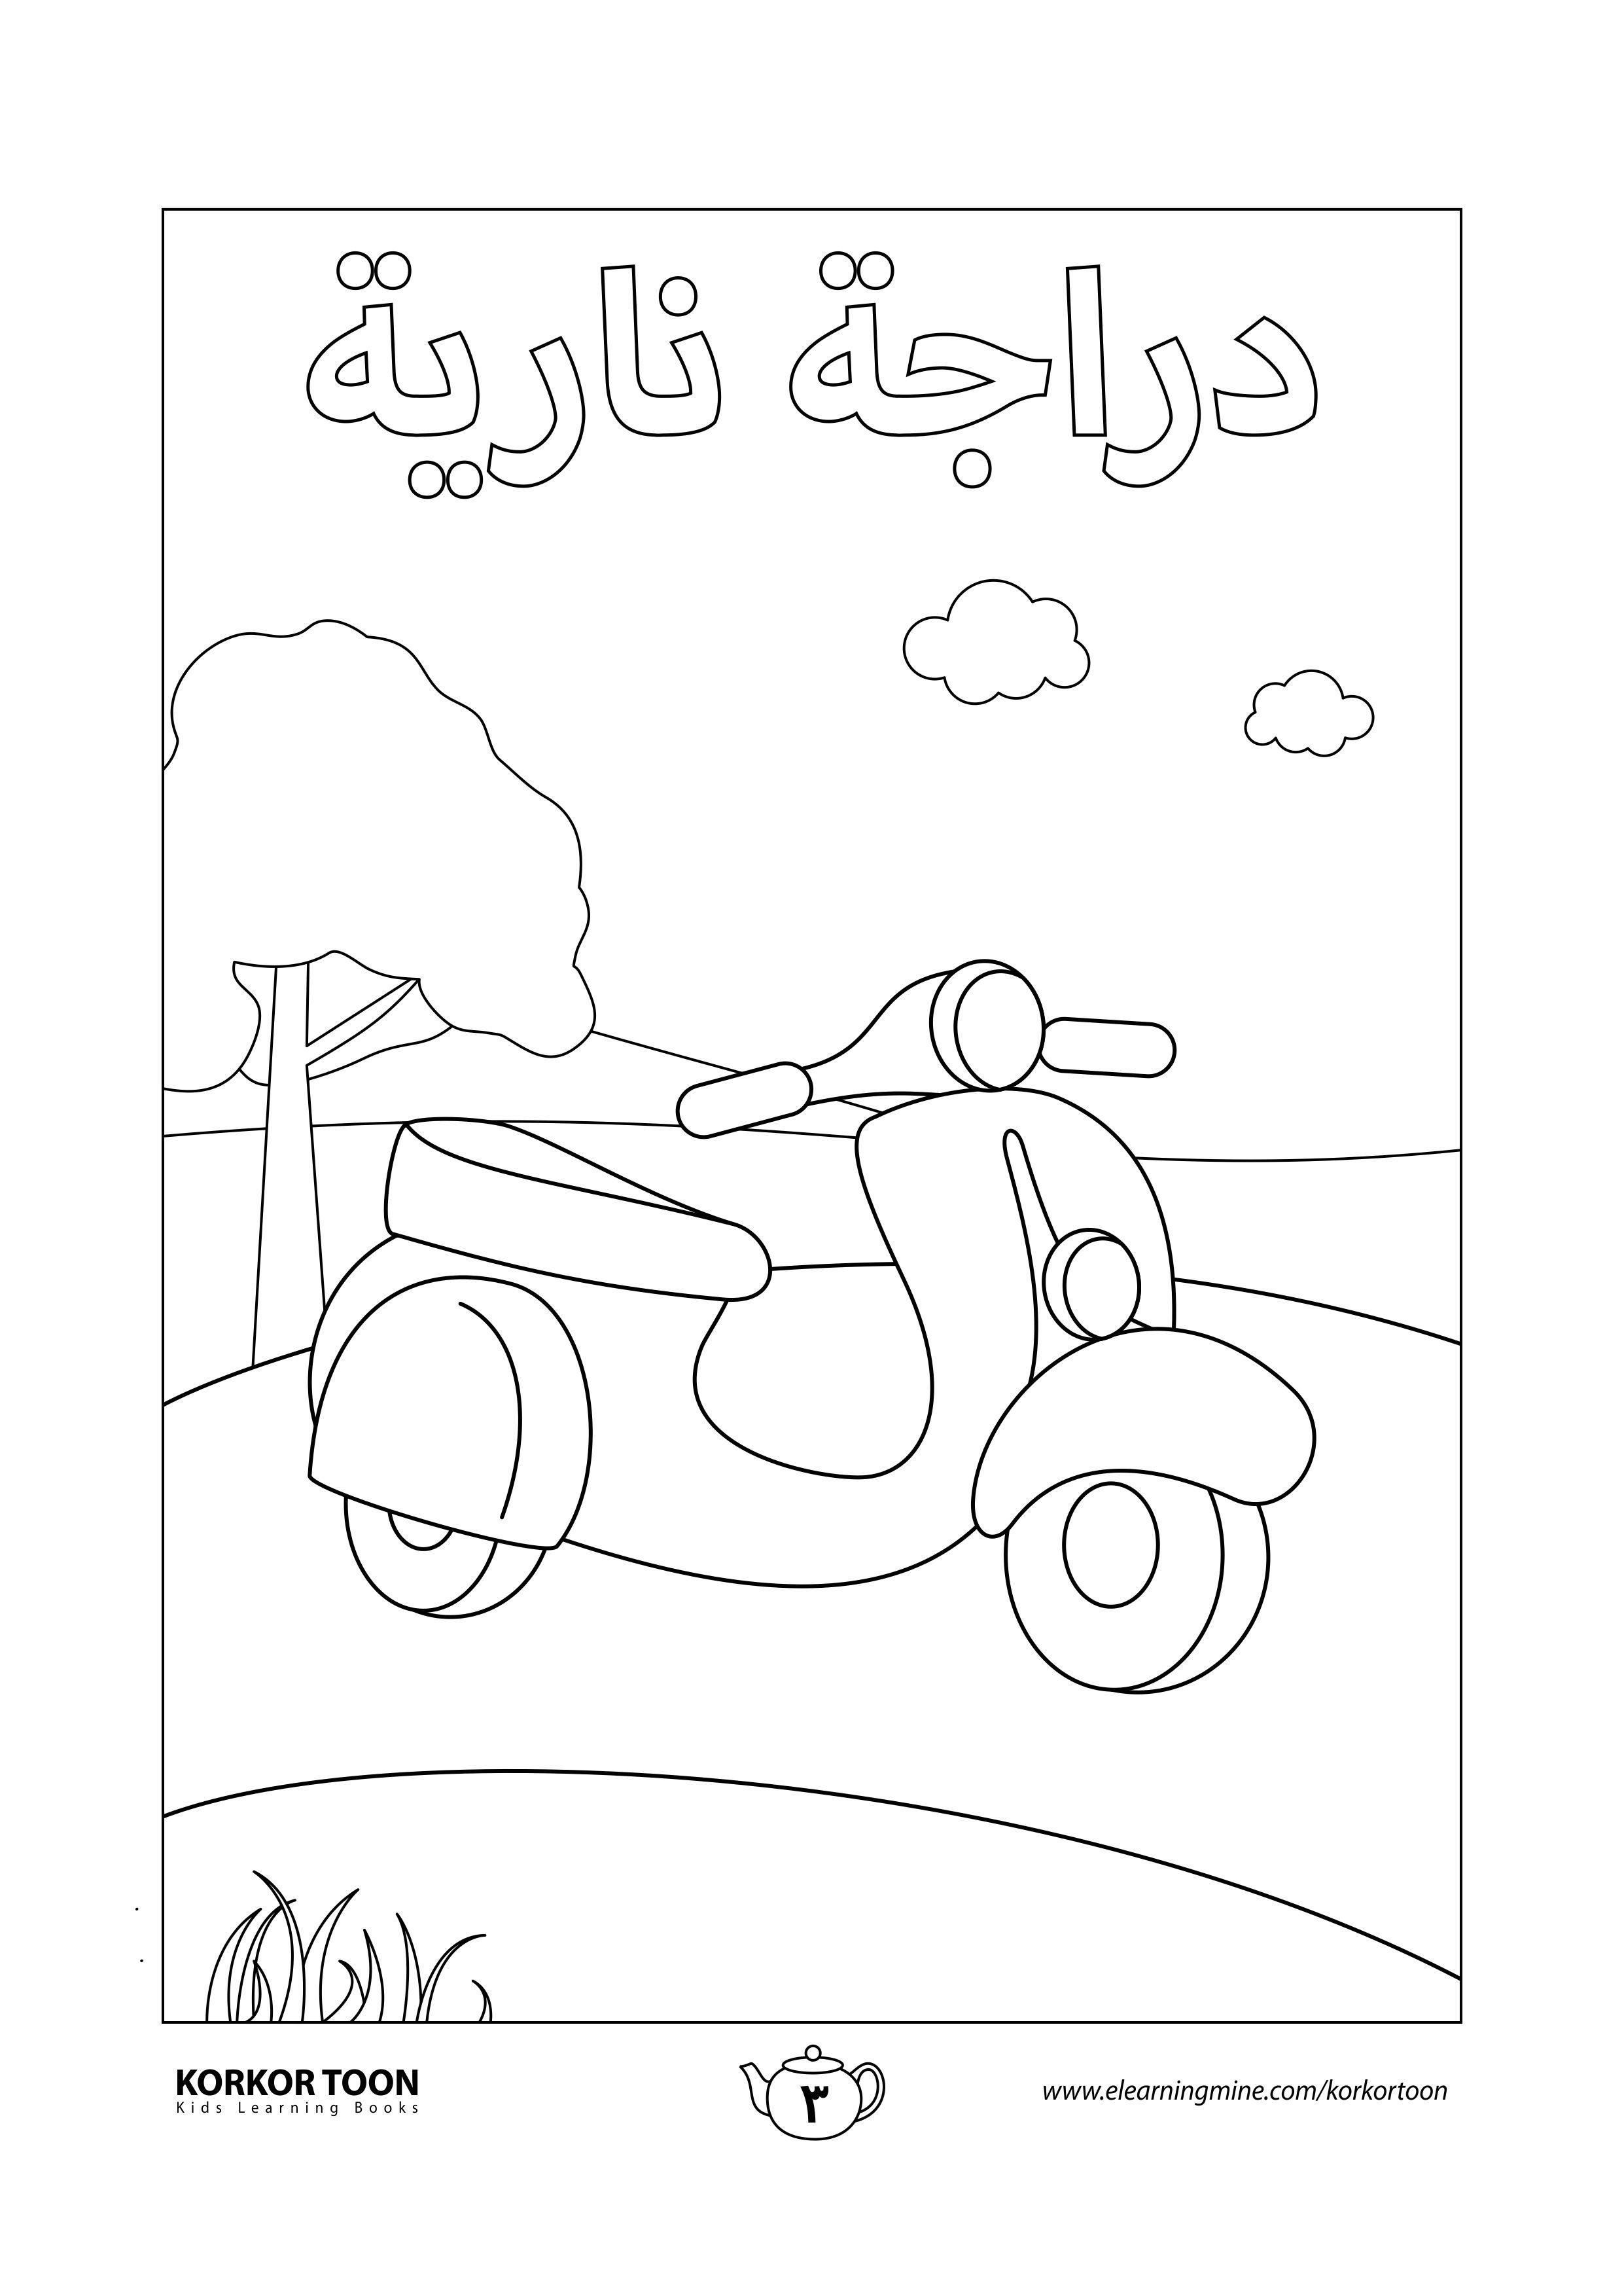 كتاب تلوين وسائل المواصلات تلوين الدراجة النارية صفحة 3 Coloring Books Kids Coloring Books Printables Free Kids